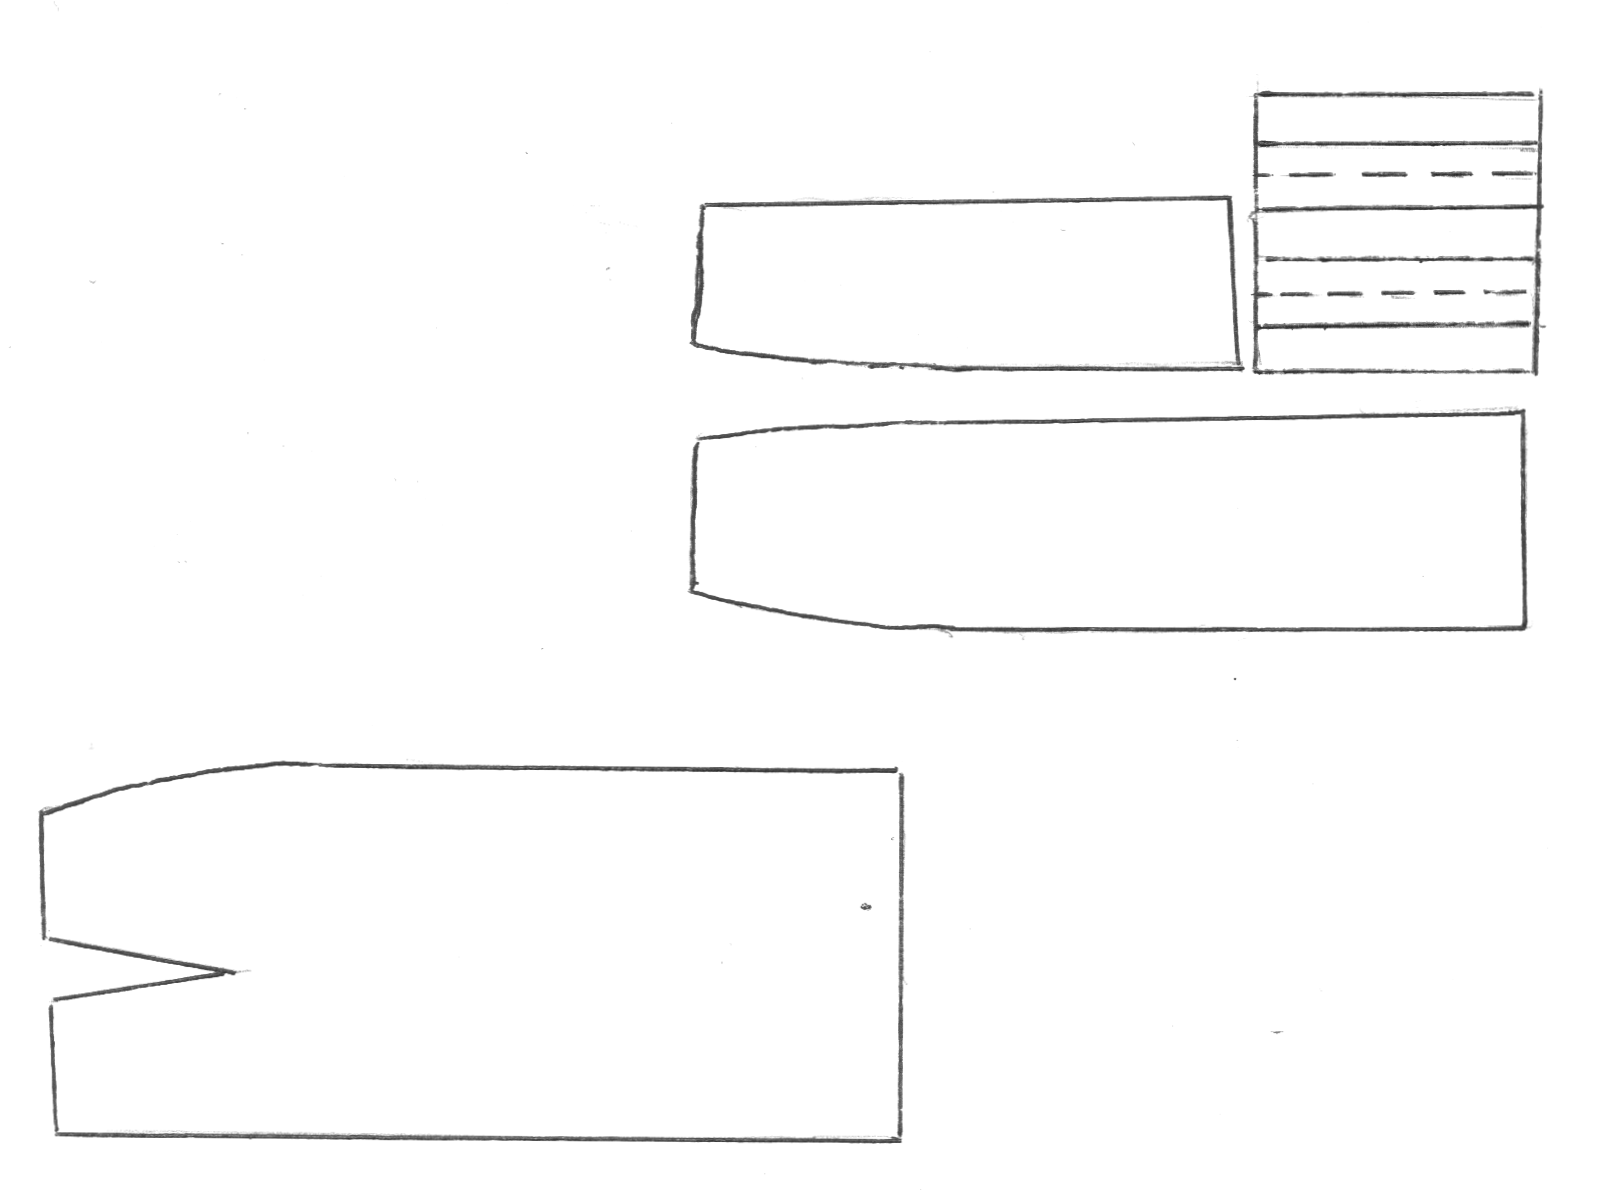 C:\Documents and Settings\Администратор\Рабочий стол\для ИЗО\7.bmp